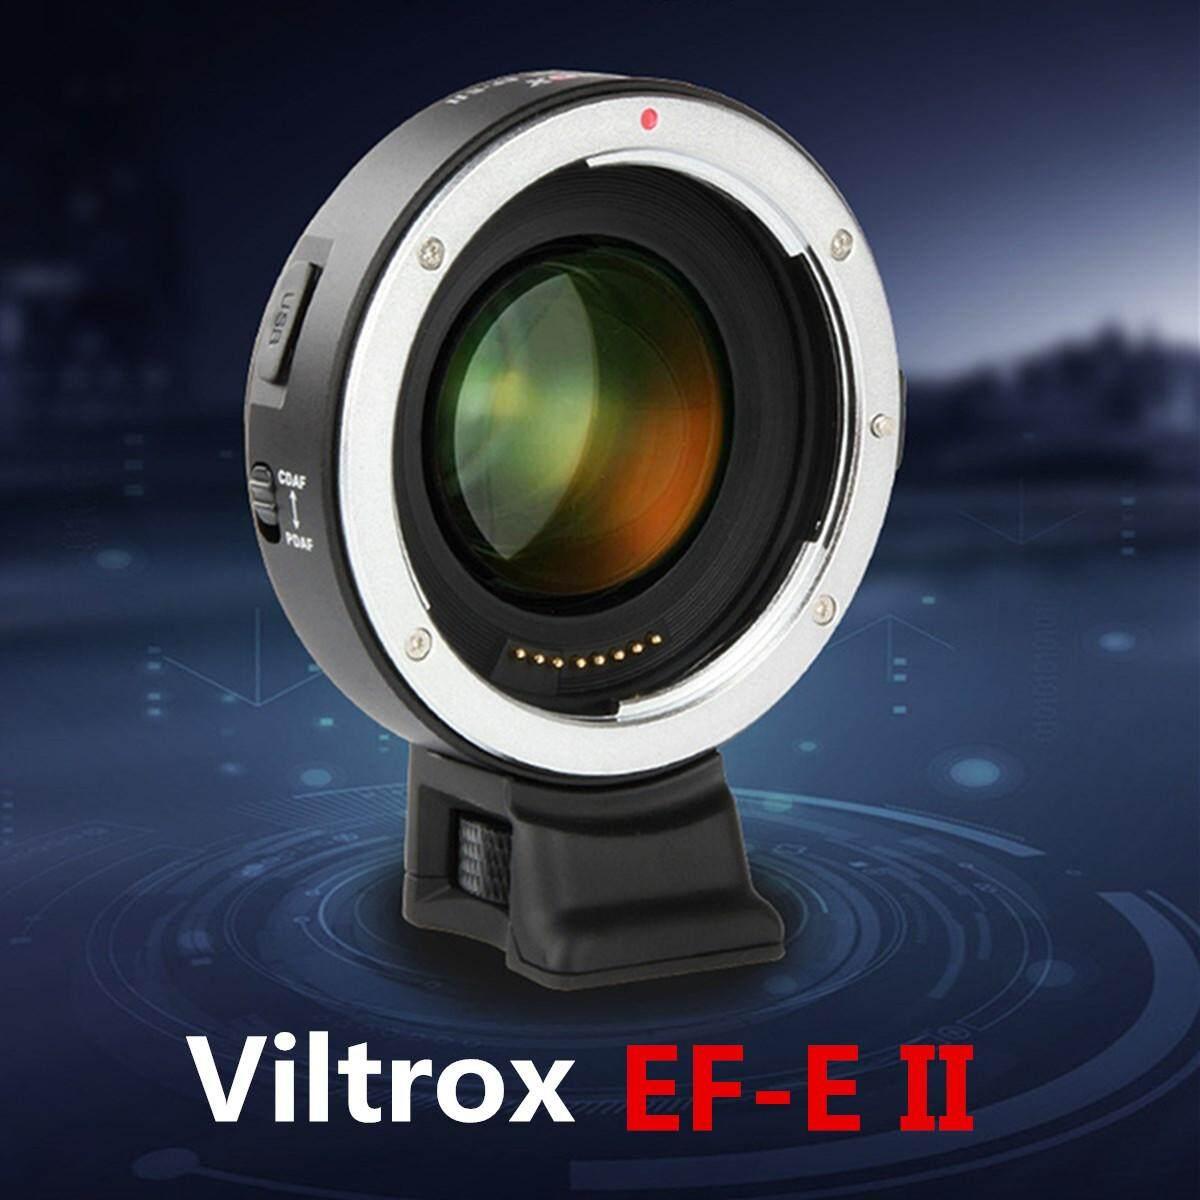 Viltrox Dealer